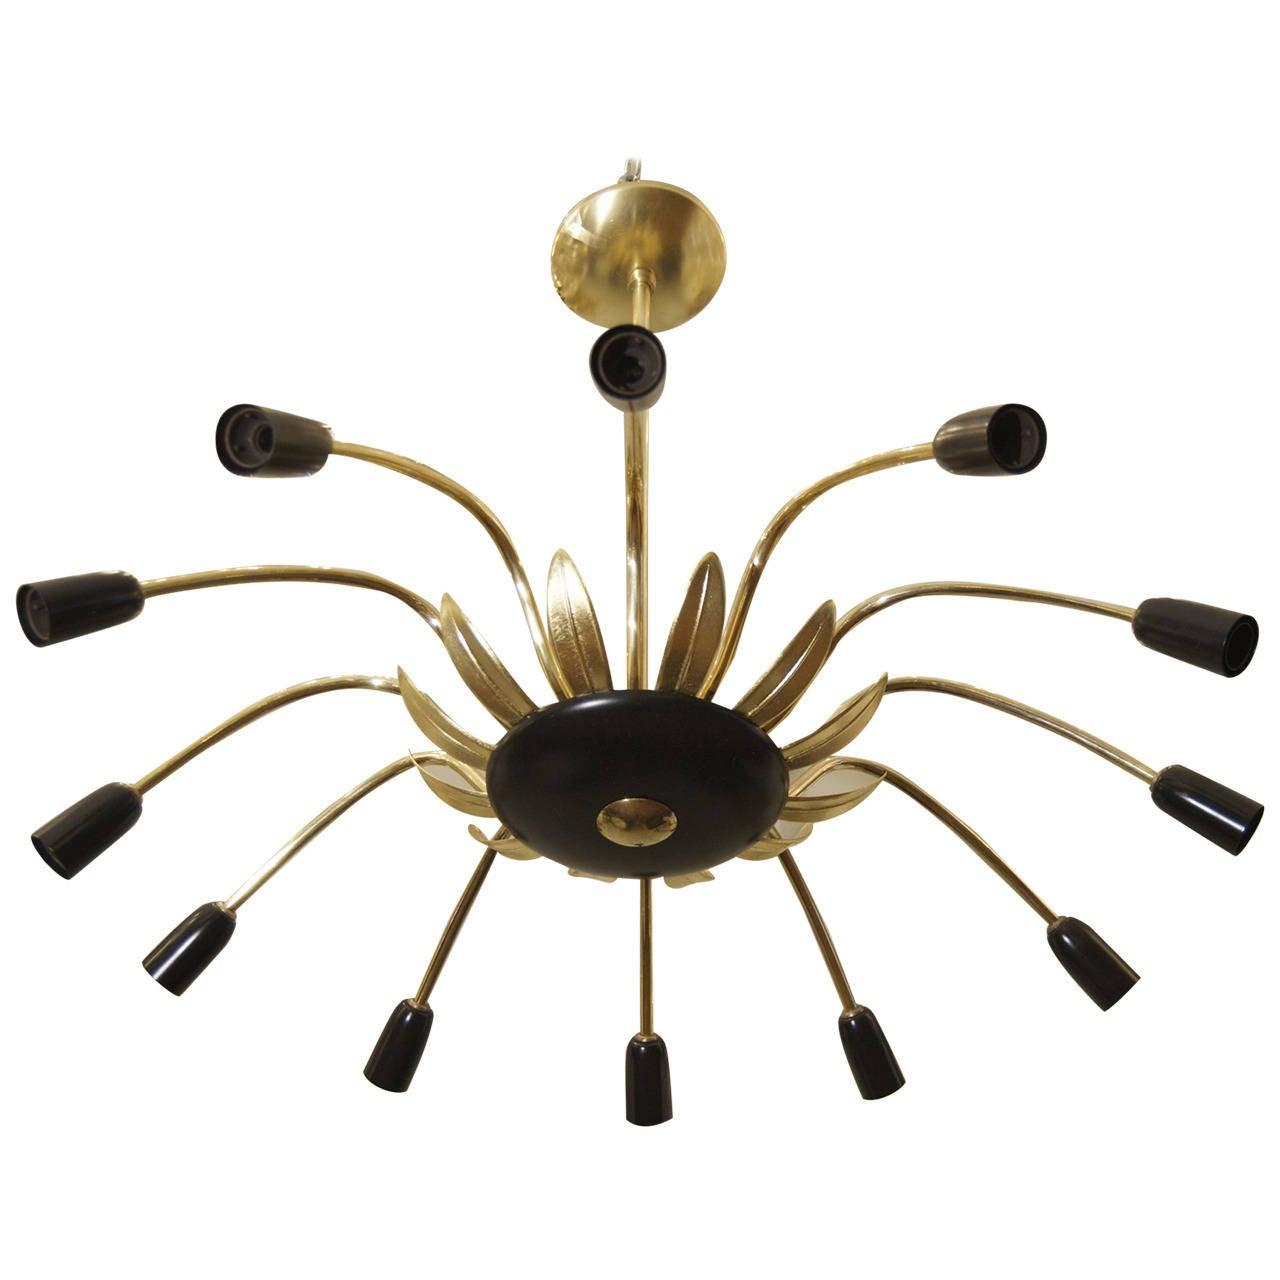 Twelve arm stilnovo style chandelier in black gold and brass for twelve arm stilnovo style chandelier in black gold and brass for sale mozeypictures Image collections